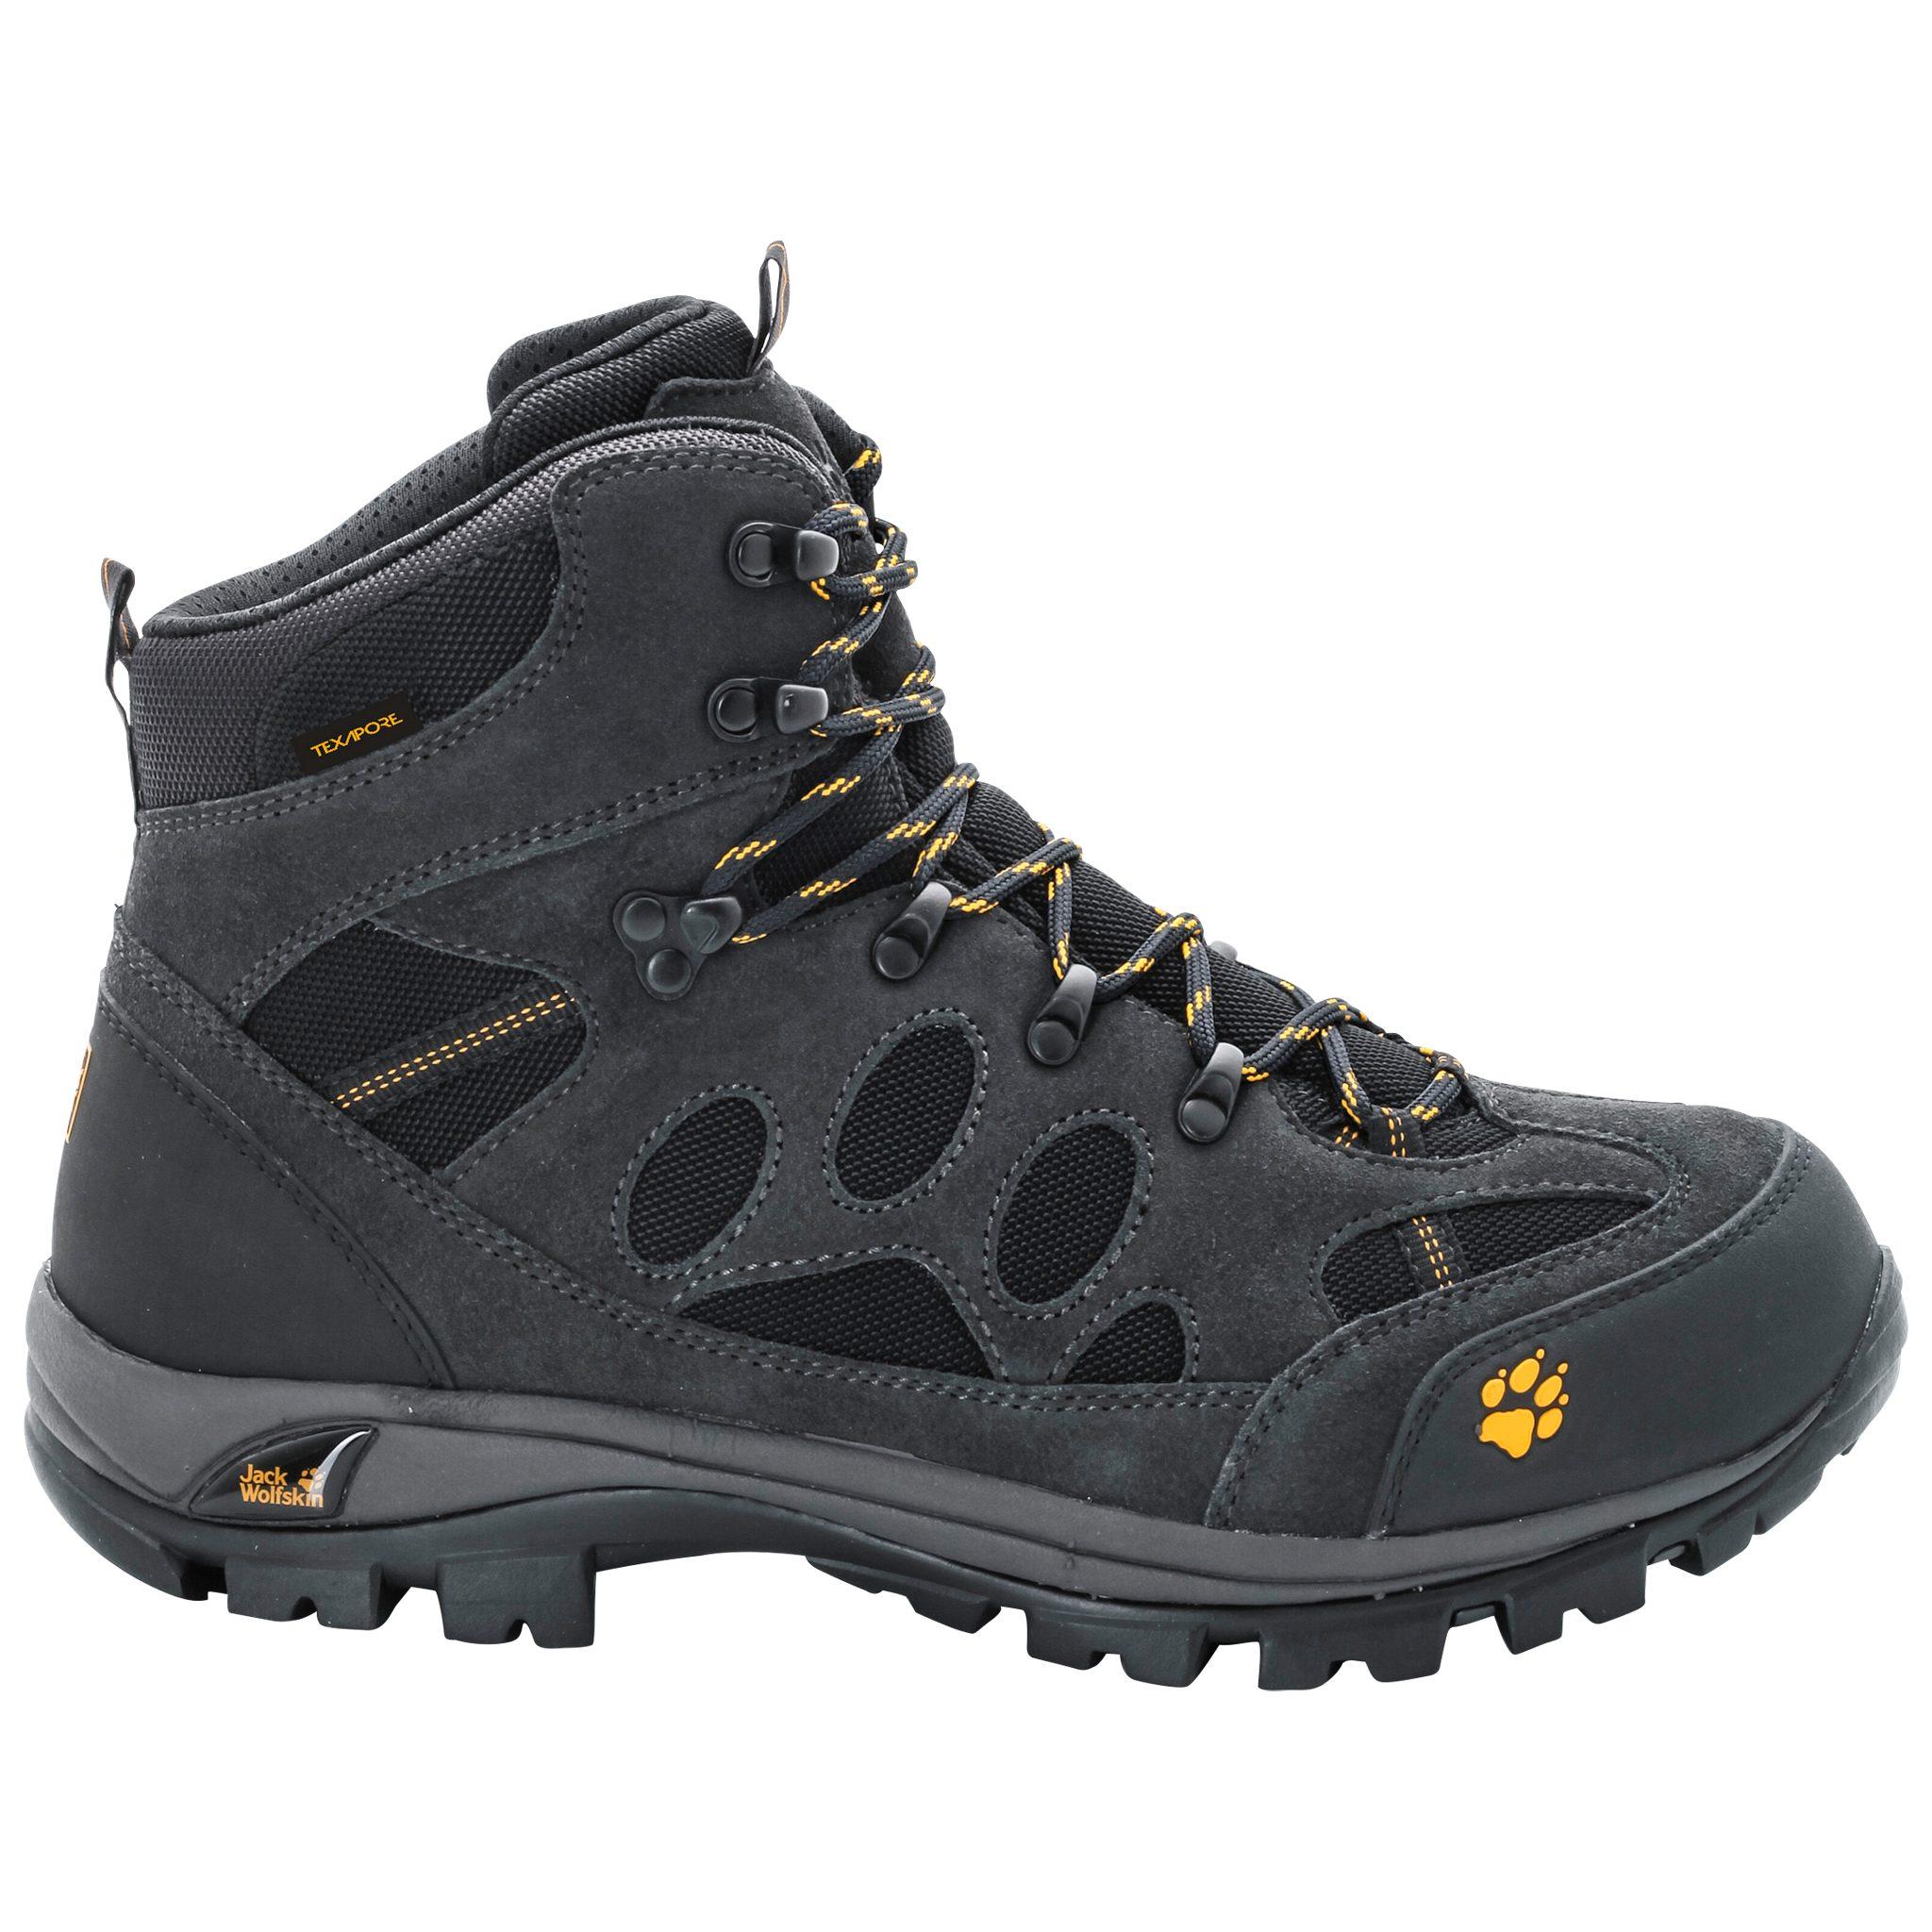 Jack Wolfskin ALL TERRAIN 7 TEXAPORE MID M Trekkingschuh online kaufen  dunkelgrau